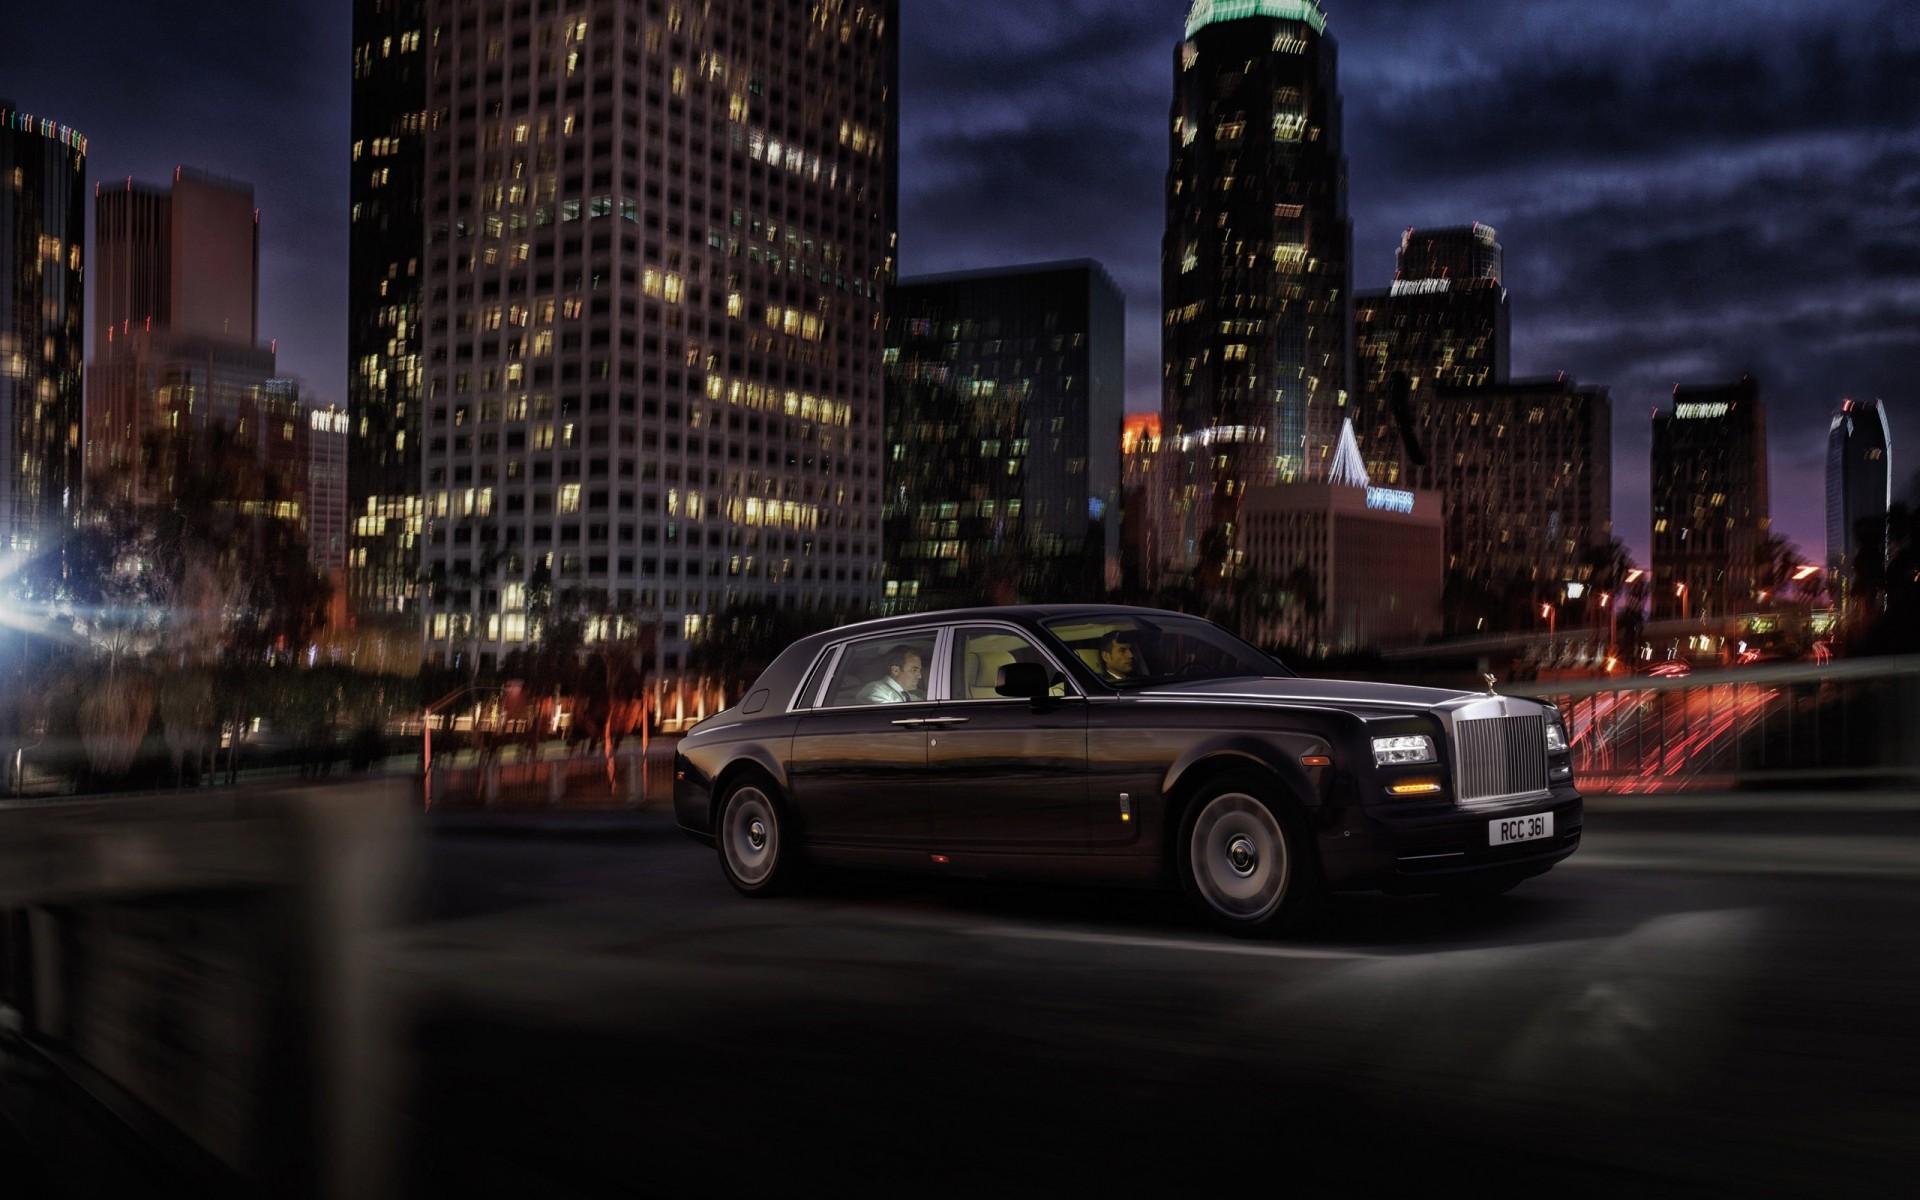 Rolls Royce Phantom Extended Wheelbase Iphone Wallpapers For Free